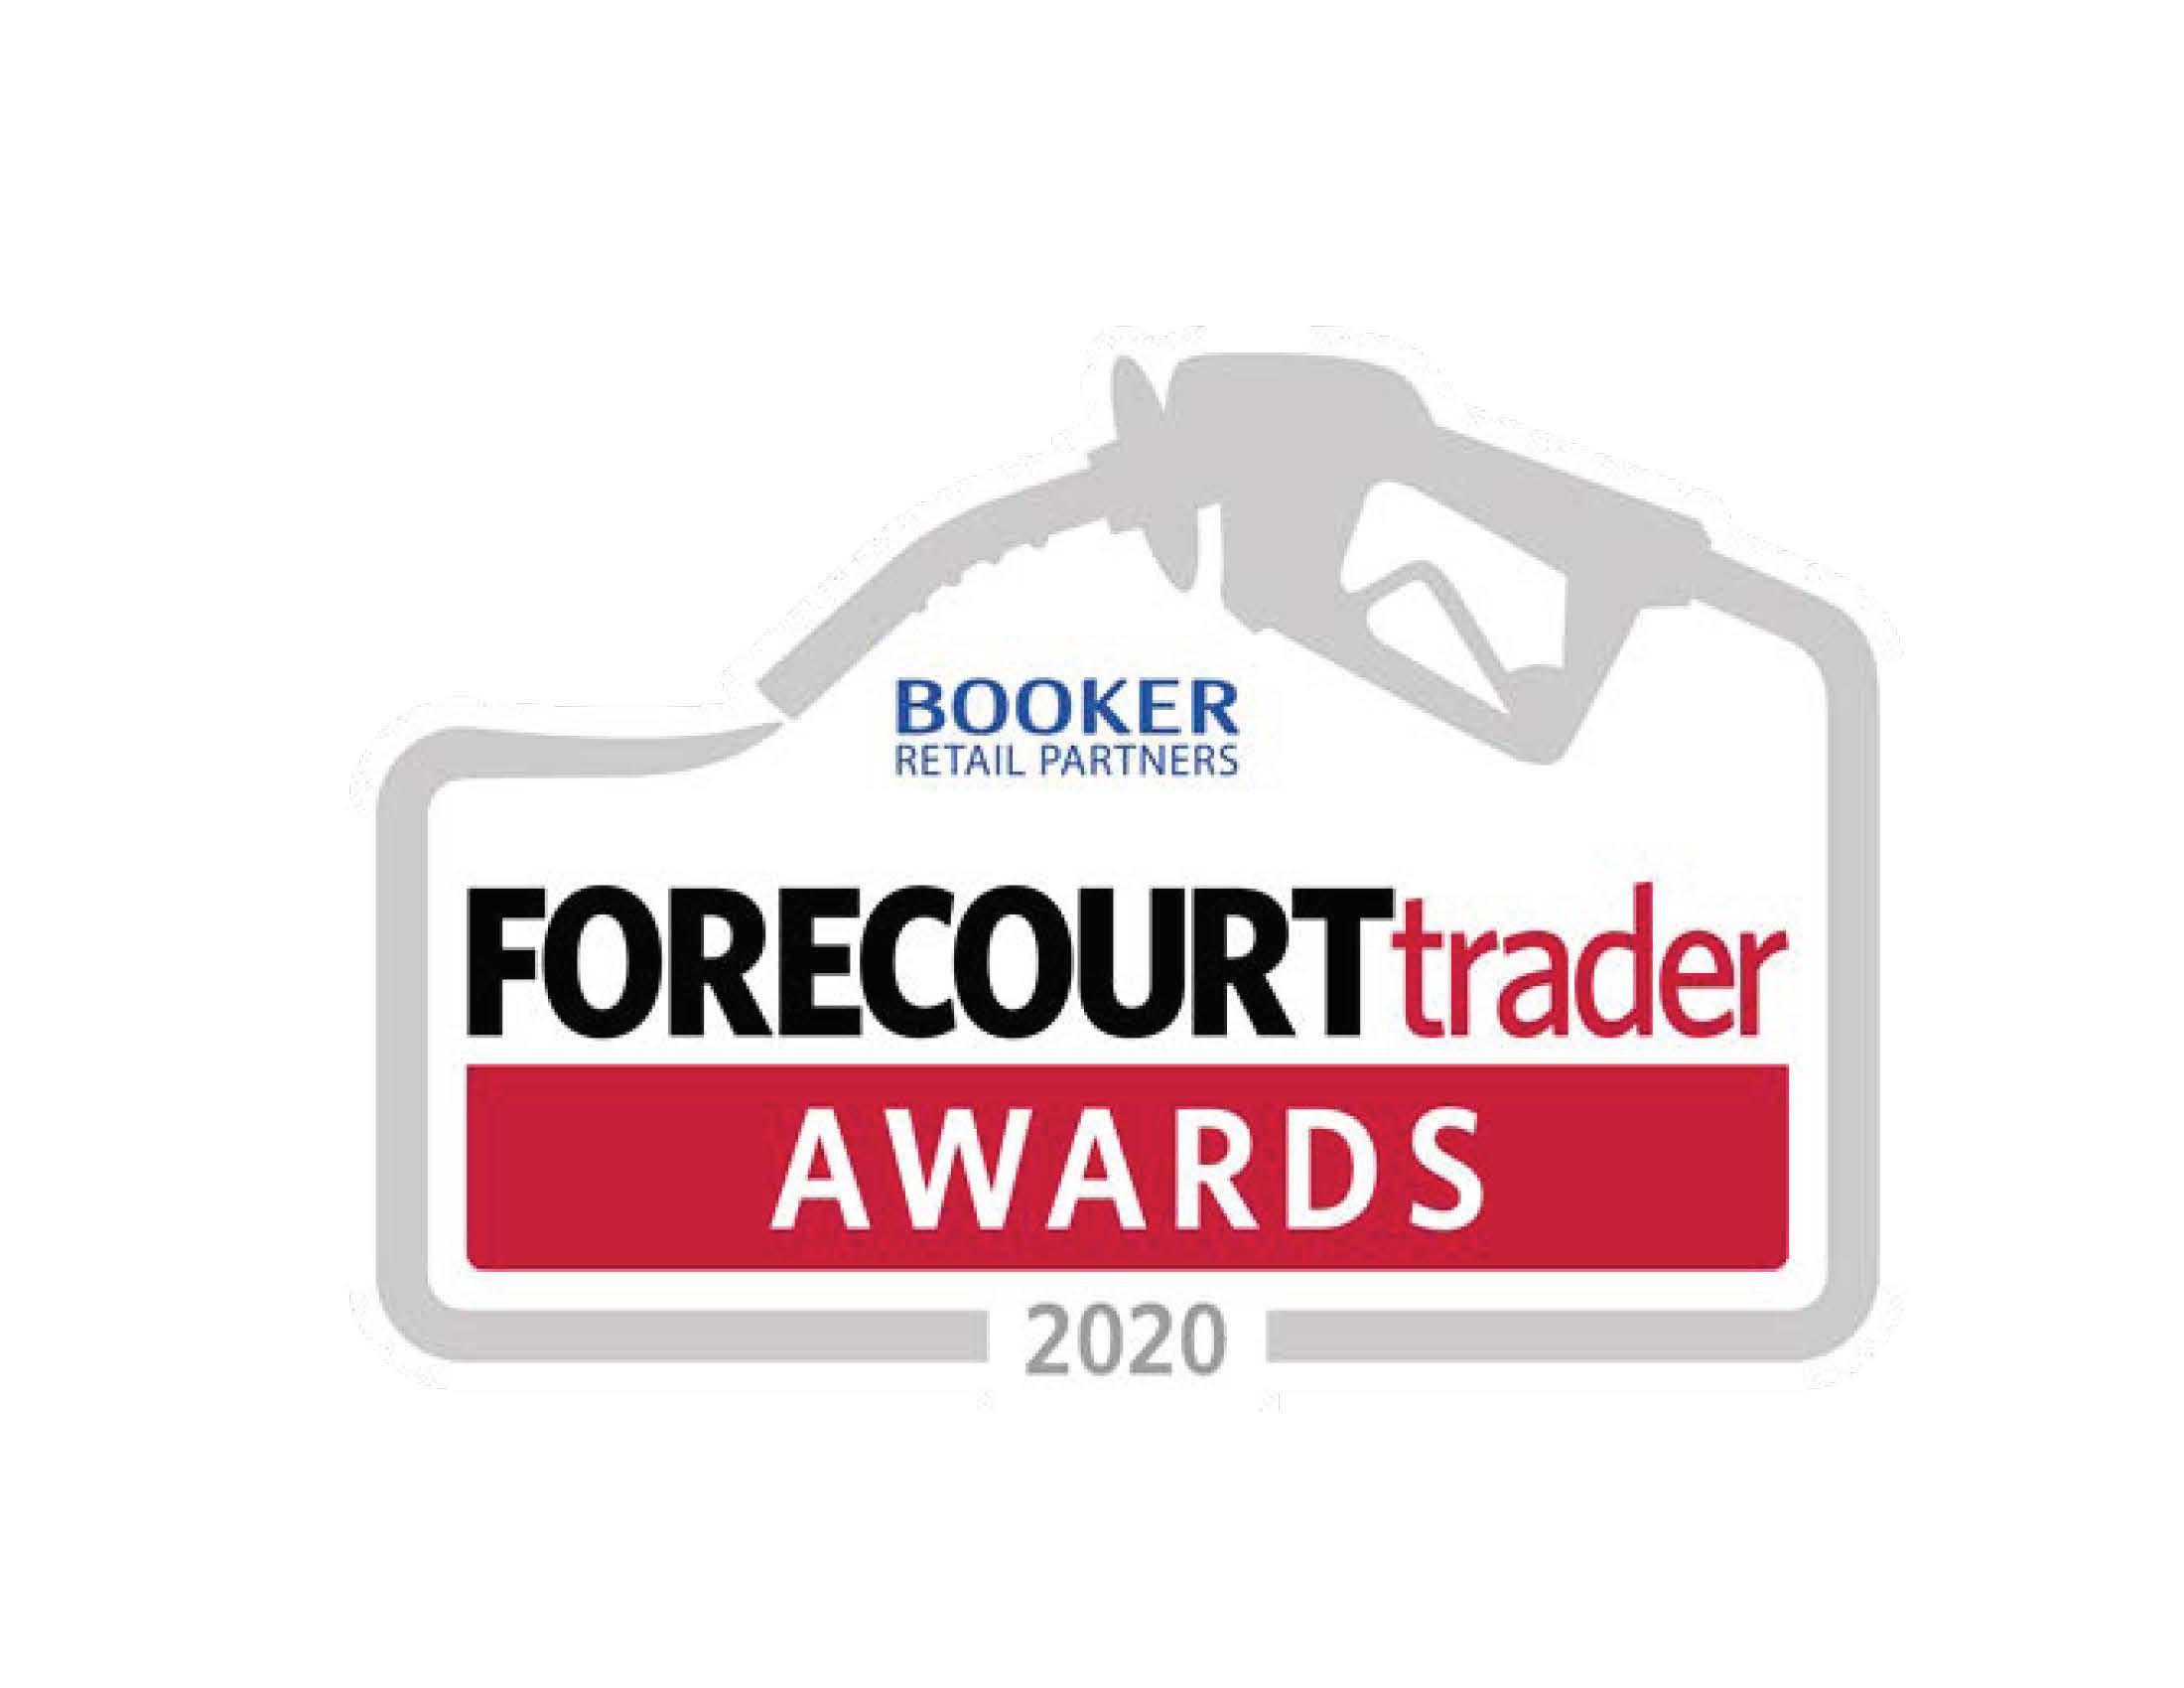 CBE customers shortlisted for UK Forecourt Trader 2020 Awards